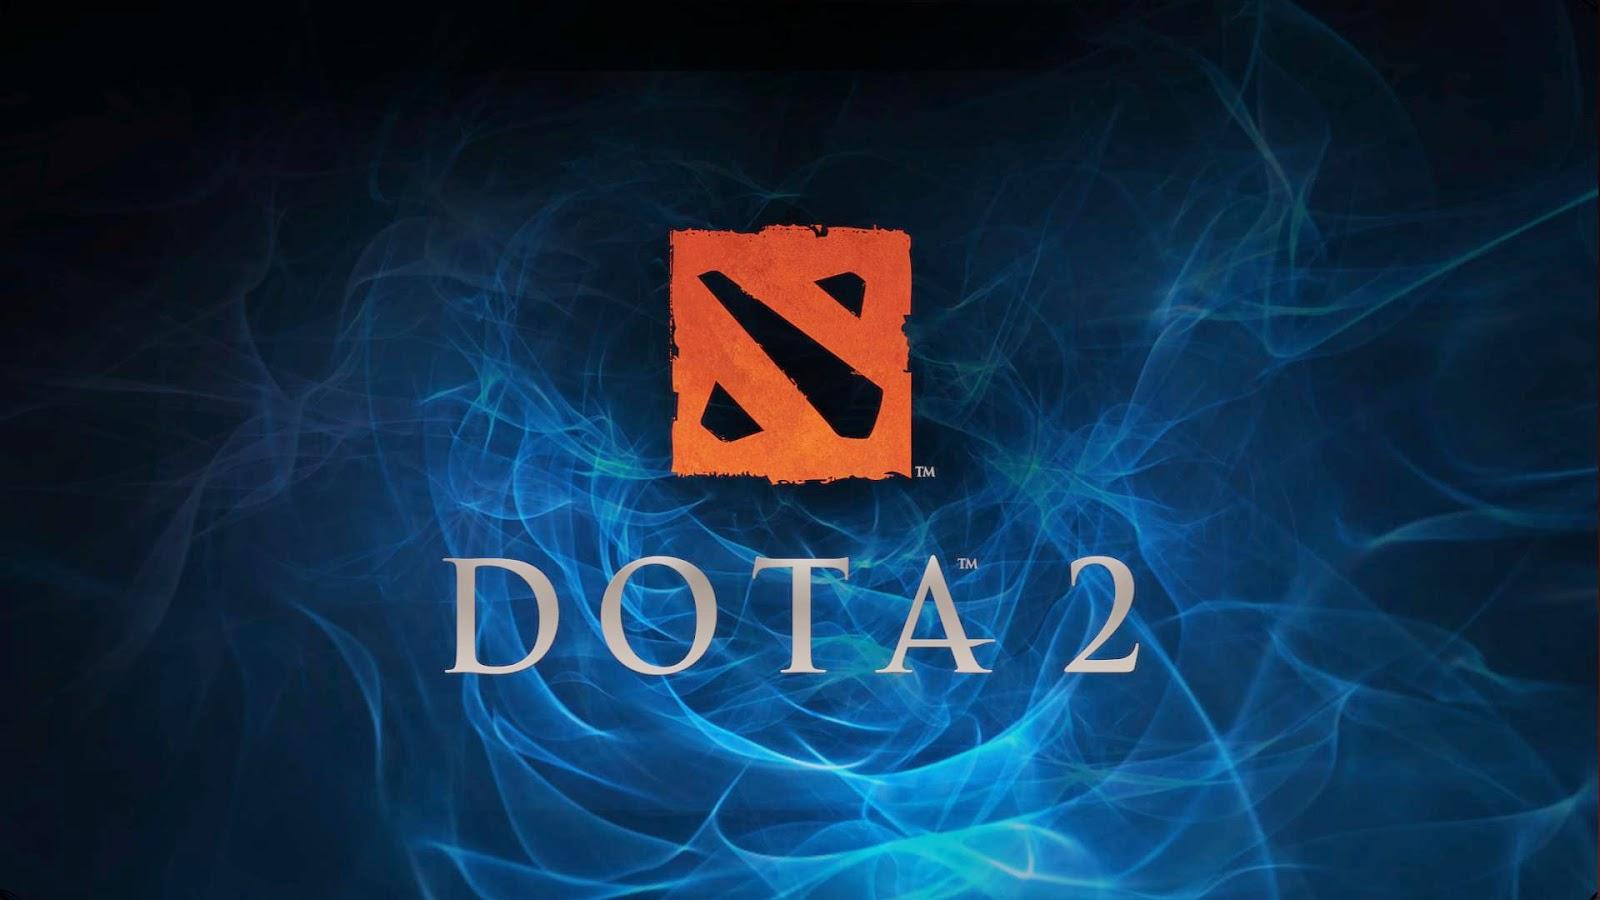 Dota 2 Pc Game Free Download (offline